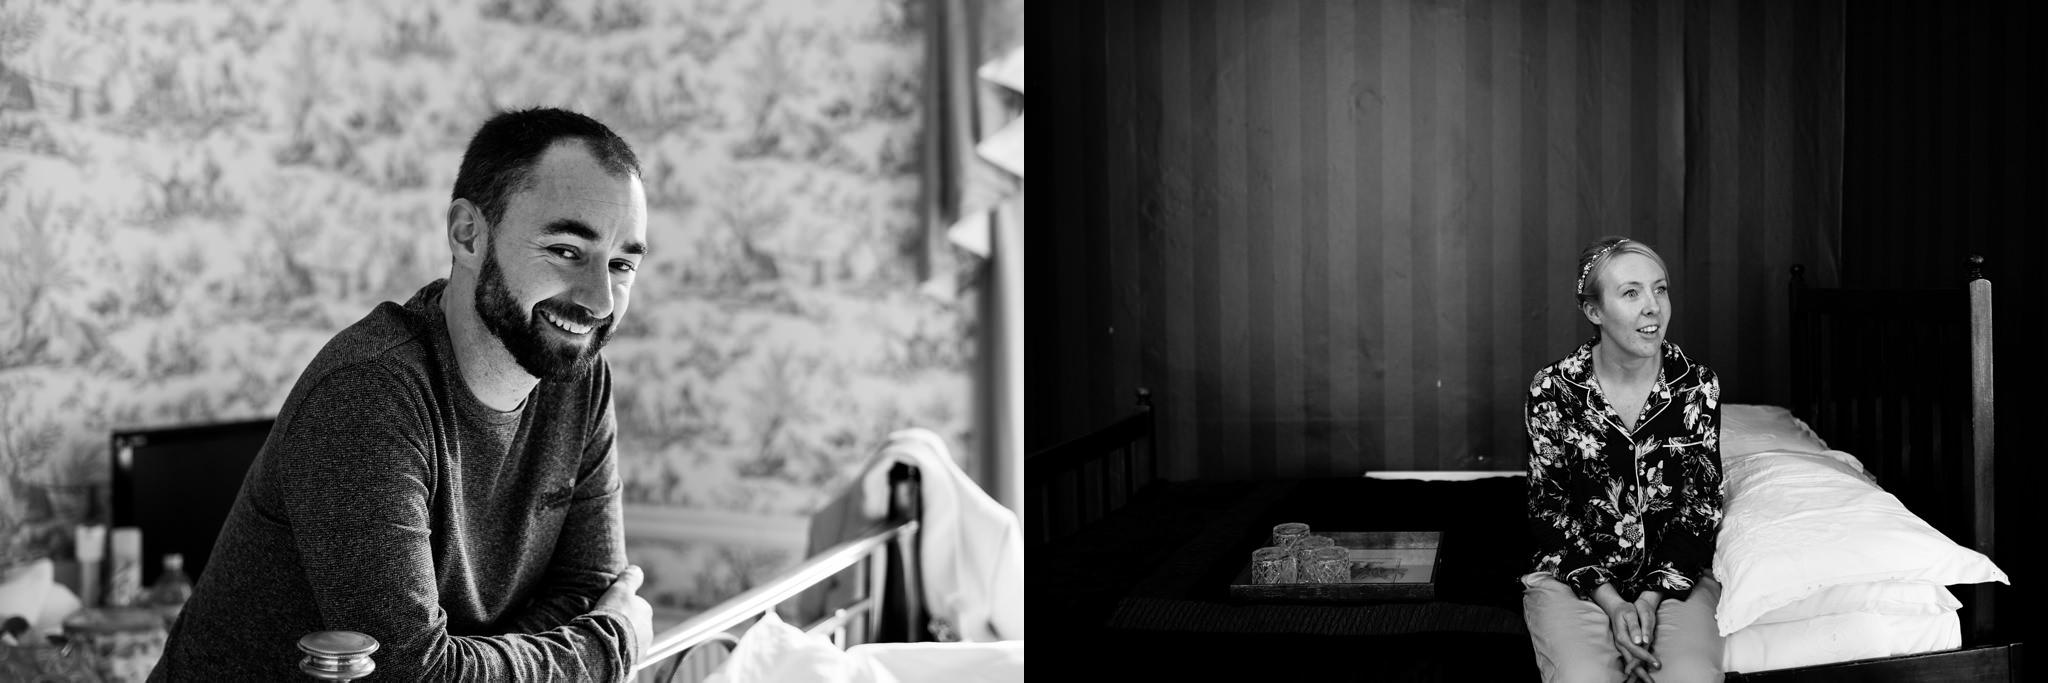 Elisha-Clarke-Photography-Dublin-City-Wedding_0033.jpg